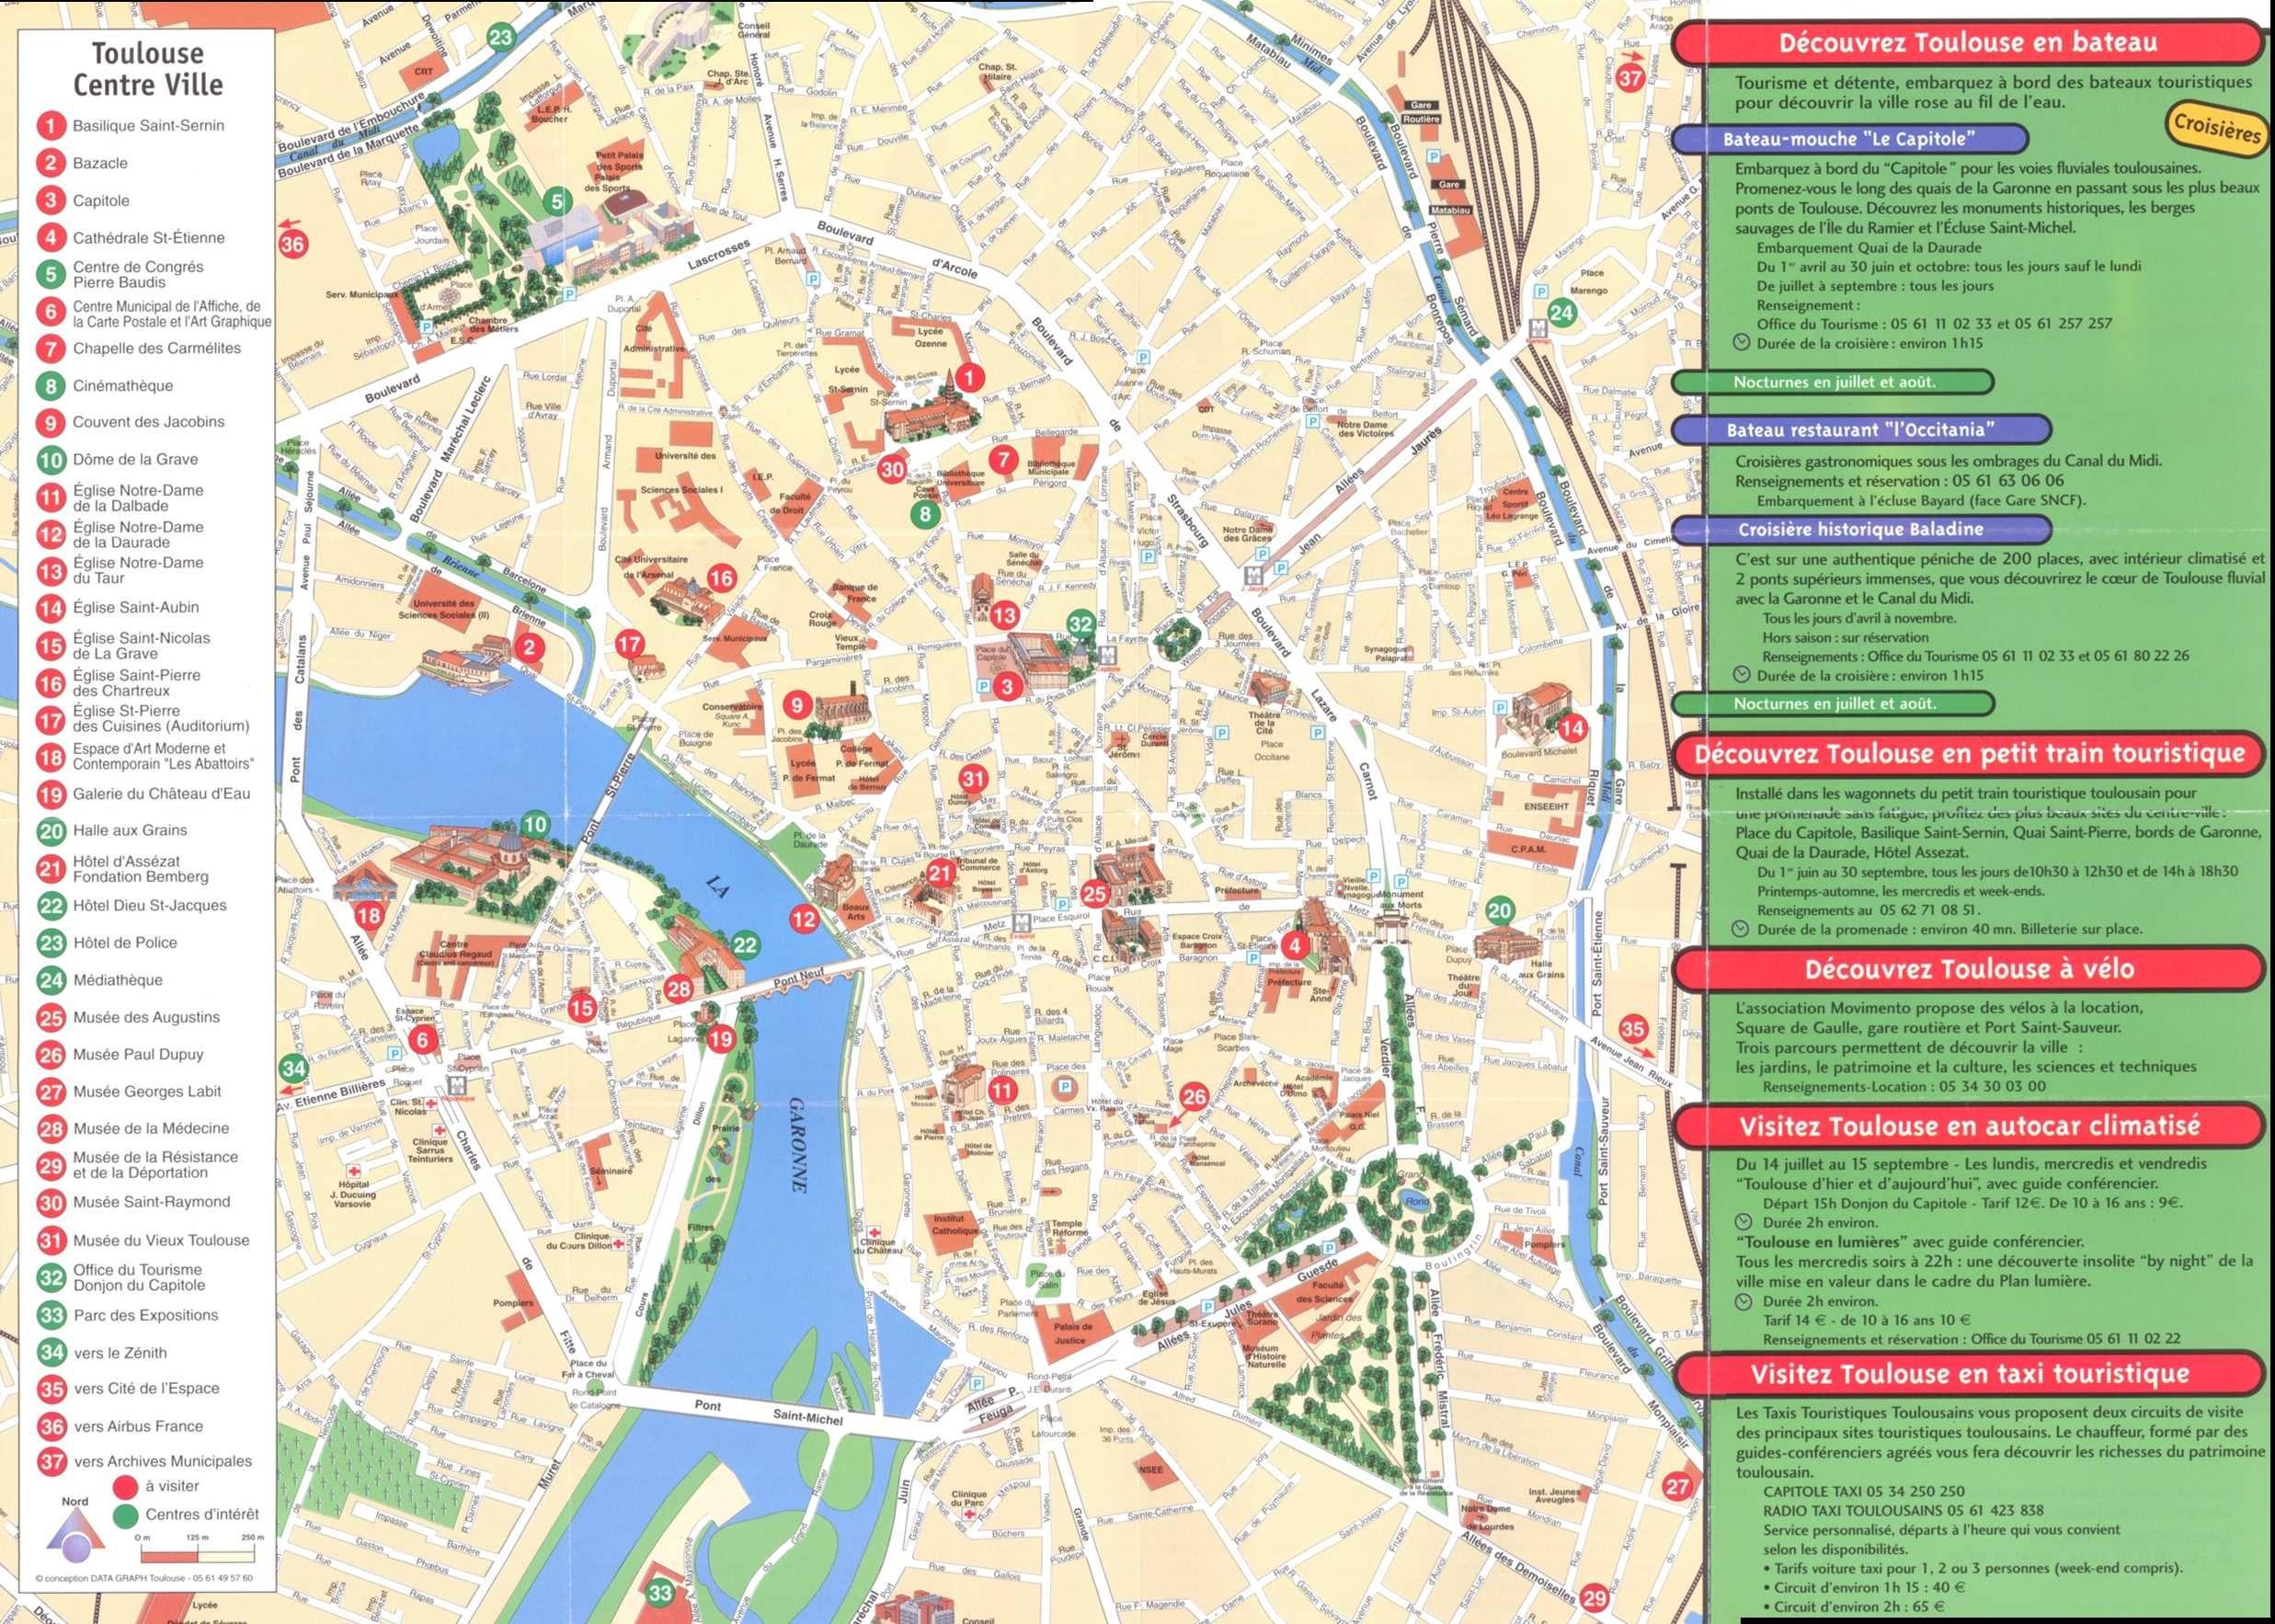 Mapa Turistico De Toulouse.Toulouse Plan De La Ciudad Mapas Imprimidos De Toulouse Francia Con Posibilidad De Descargar Toulouse Guia Turistico Turistico